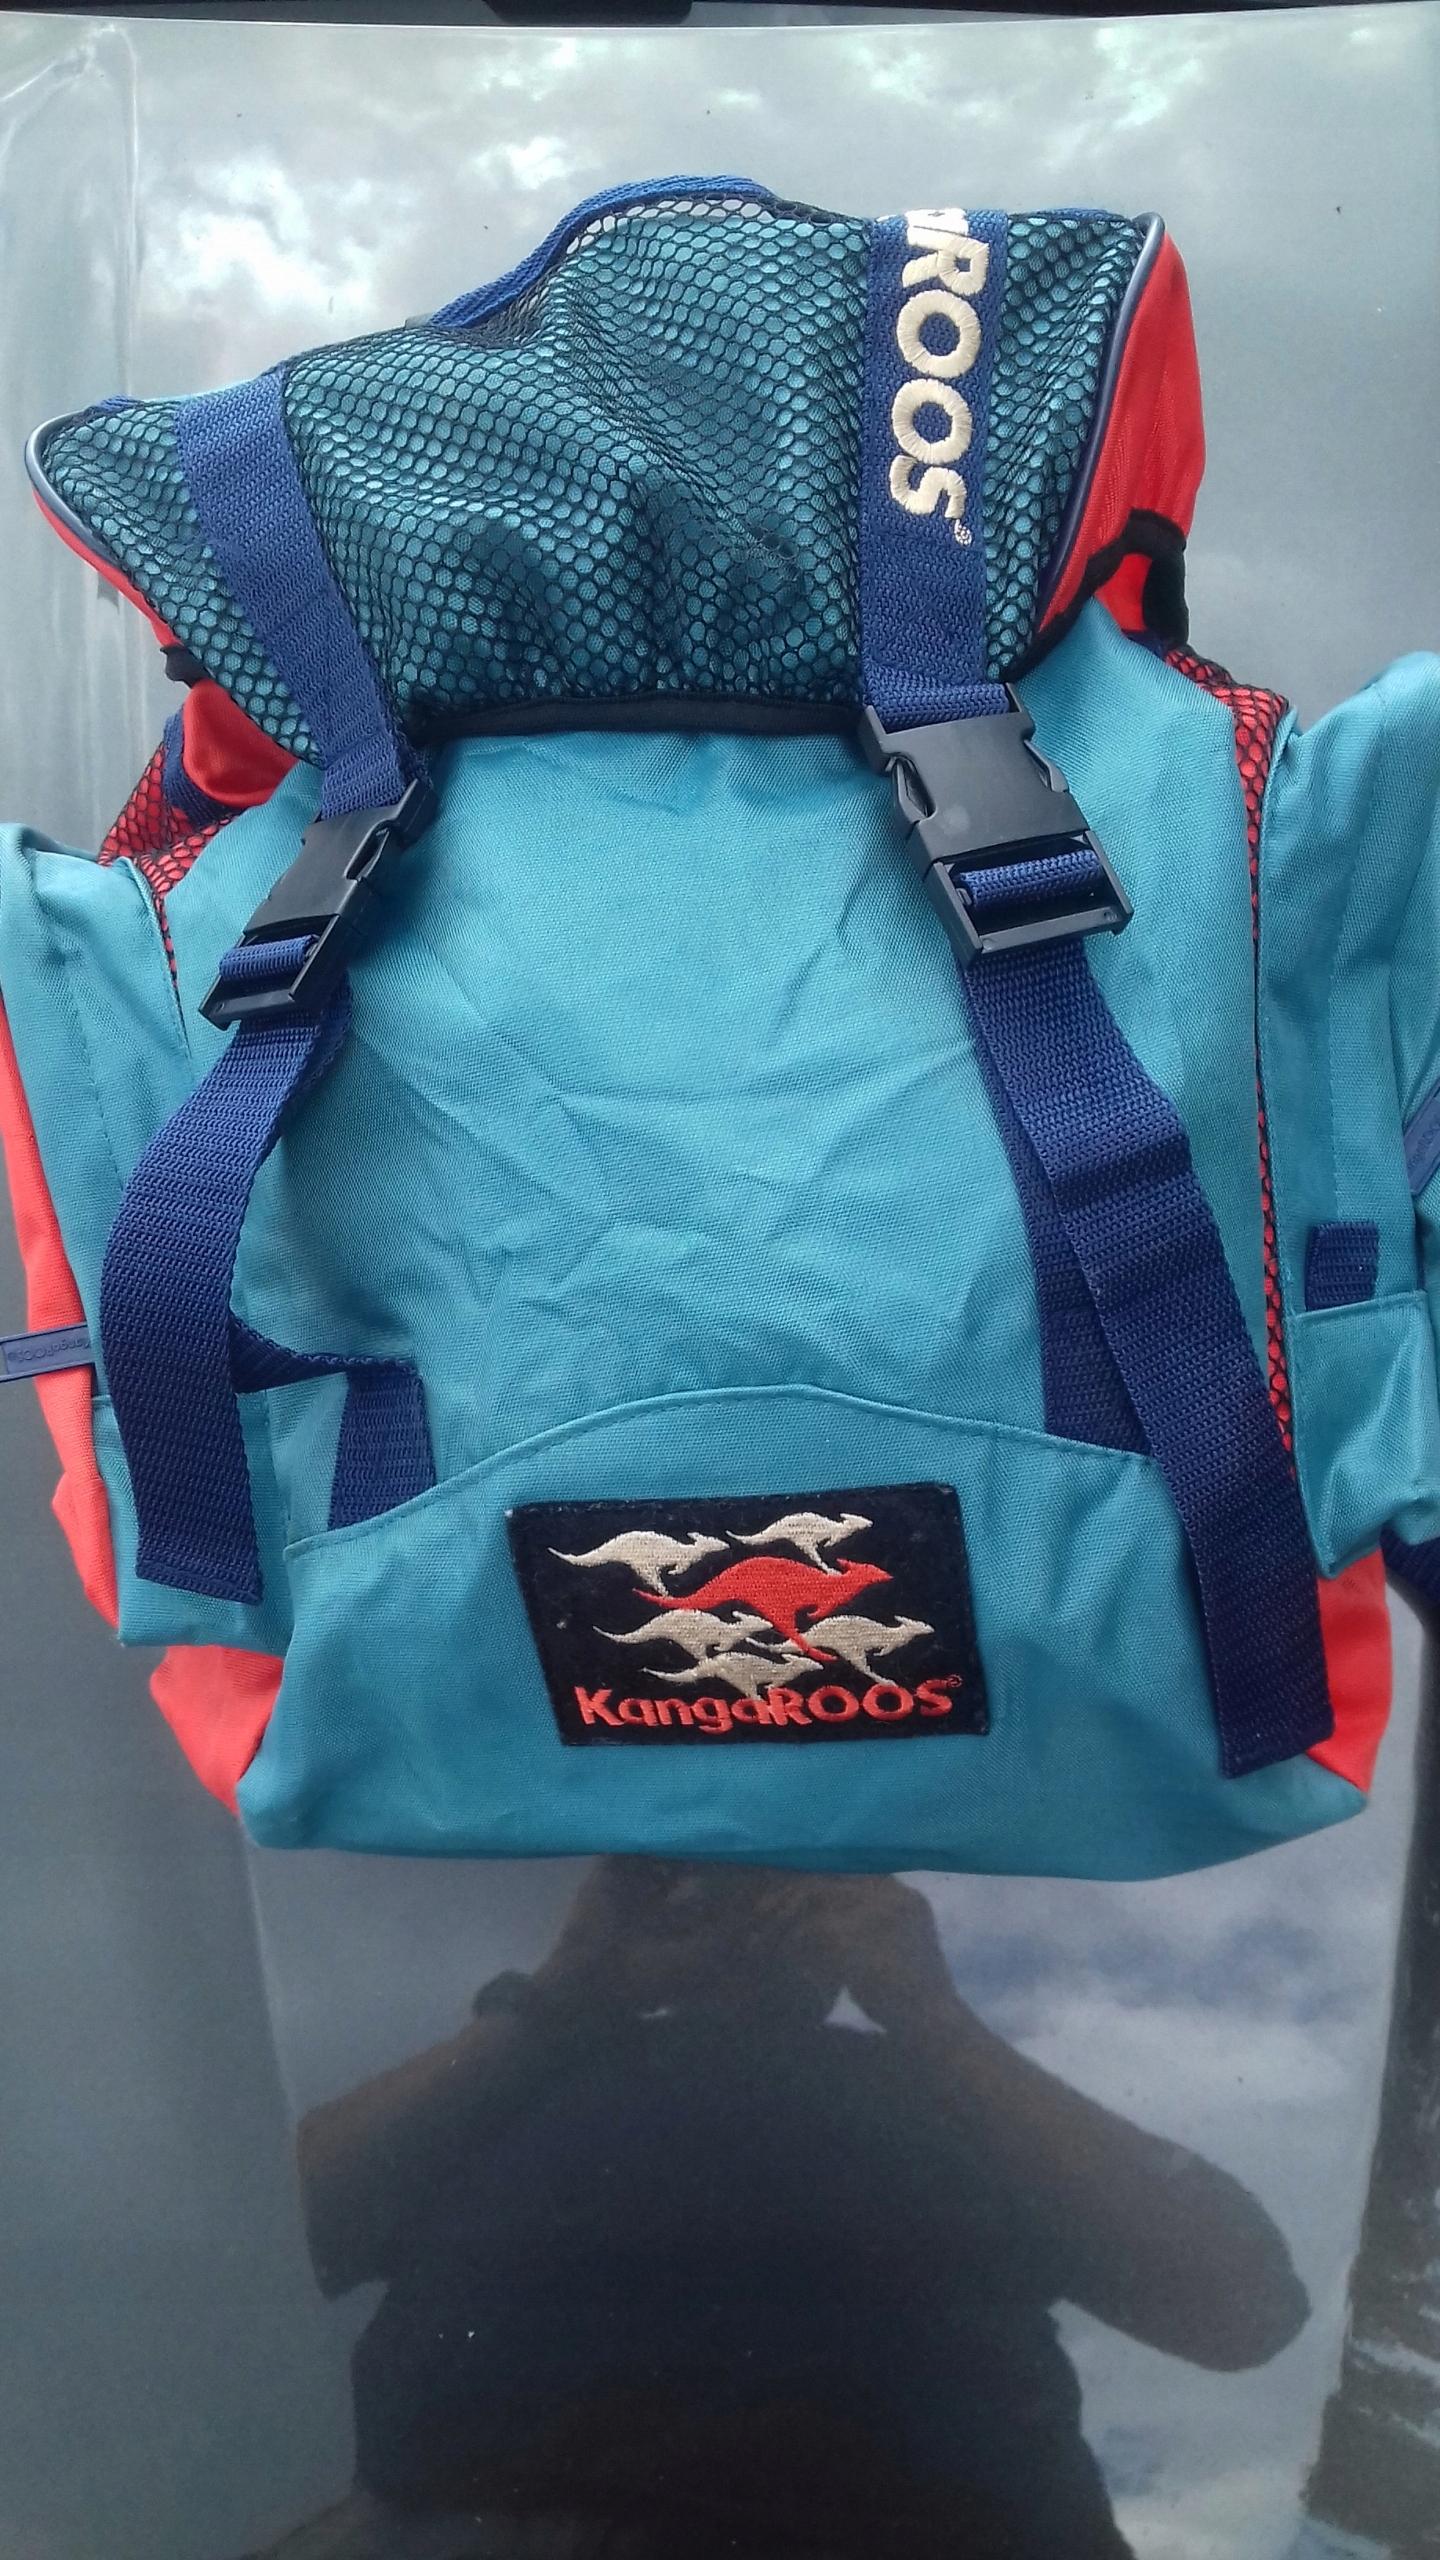 d305286afba22 Plecak sportowy KANGAROOS - 7443898318 - oficjalne archiwum allegro